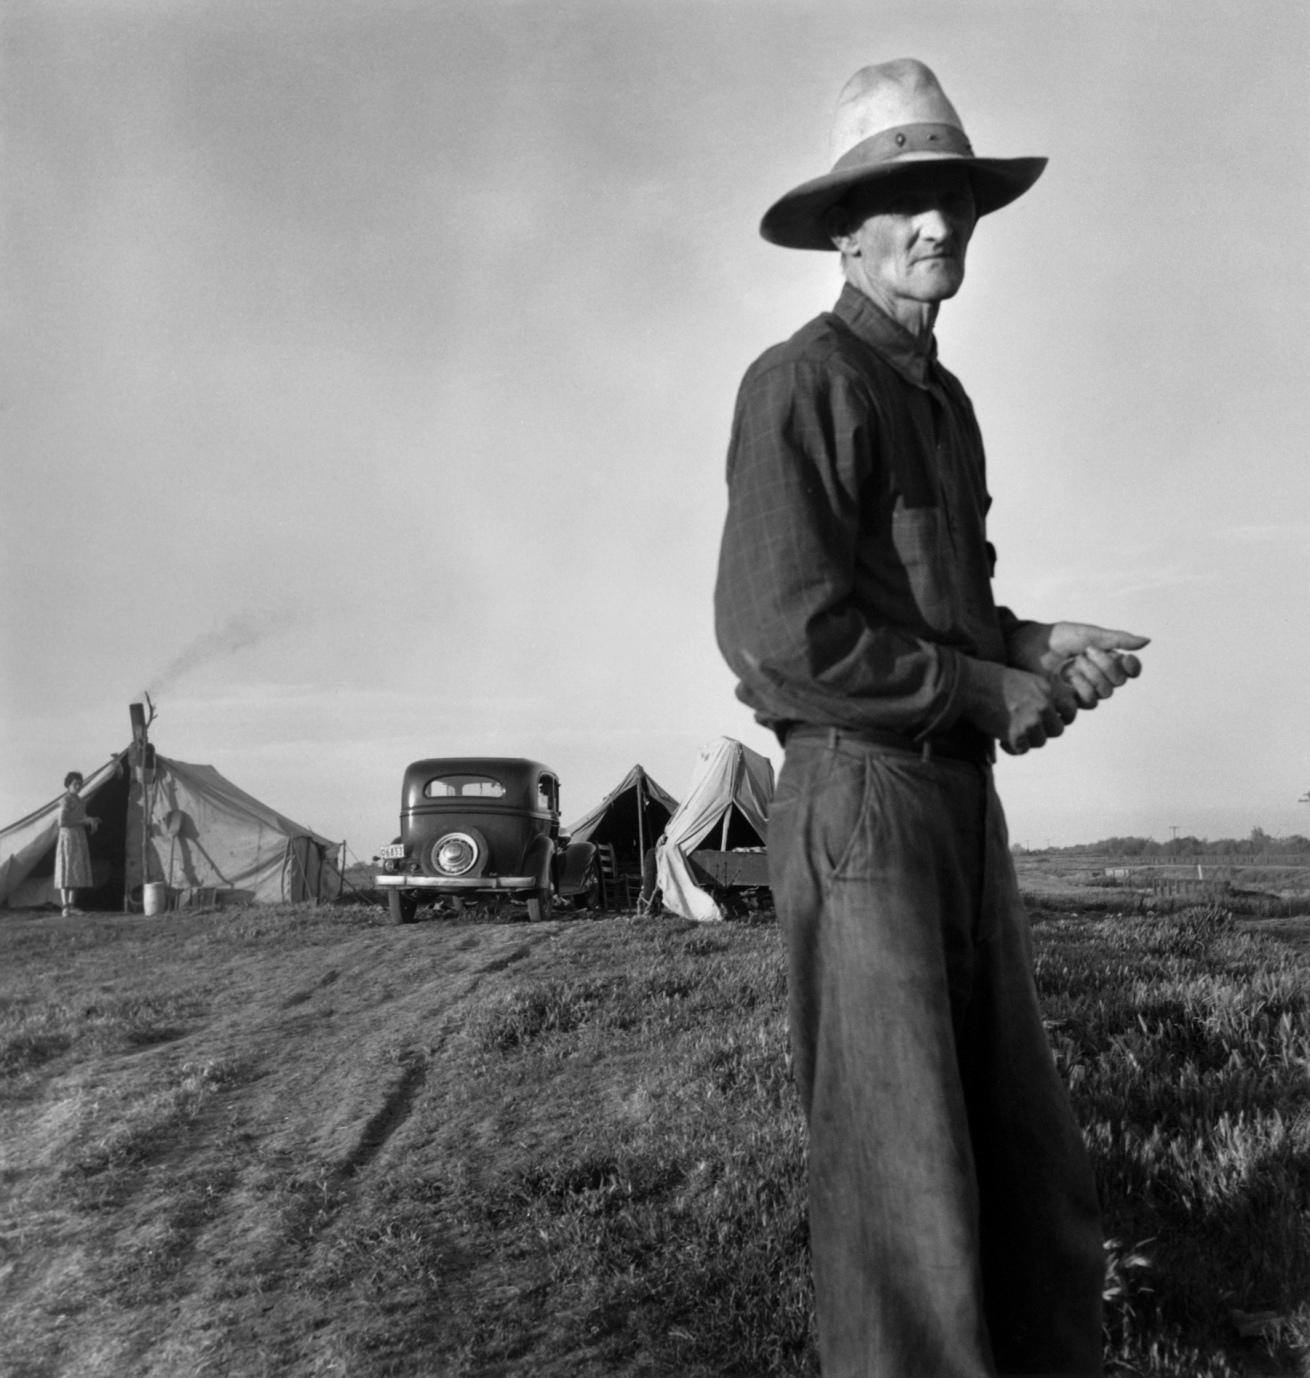 Fotó: Dorothea Lange: Aszálykárosult, c. 1935 © The Dorothea Lange Collection, the Oakland Museum of California